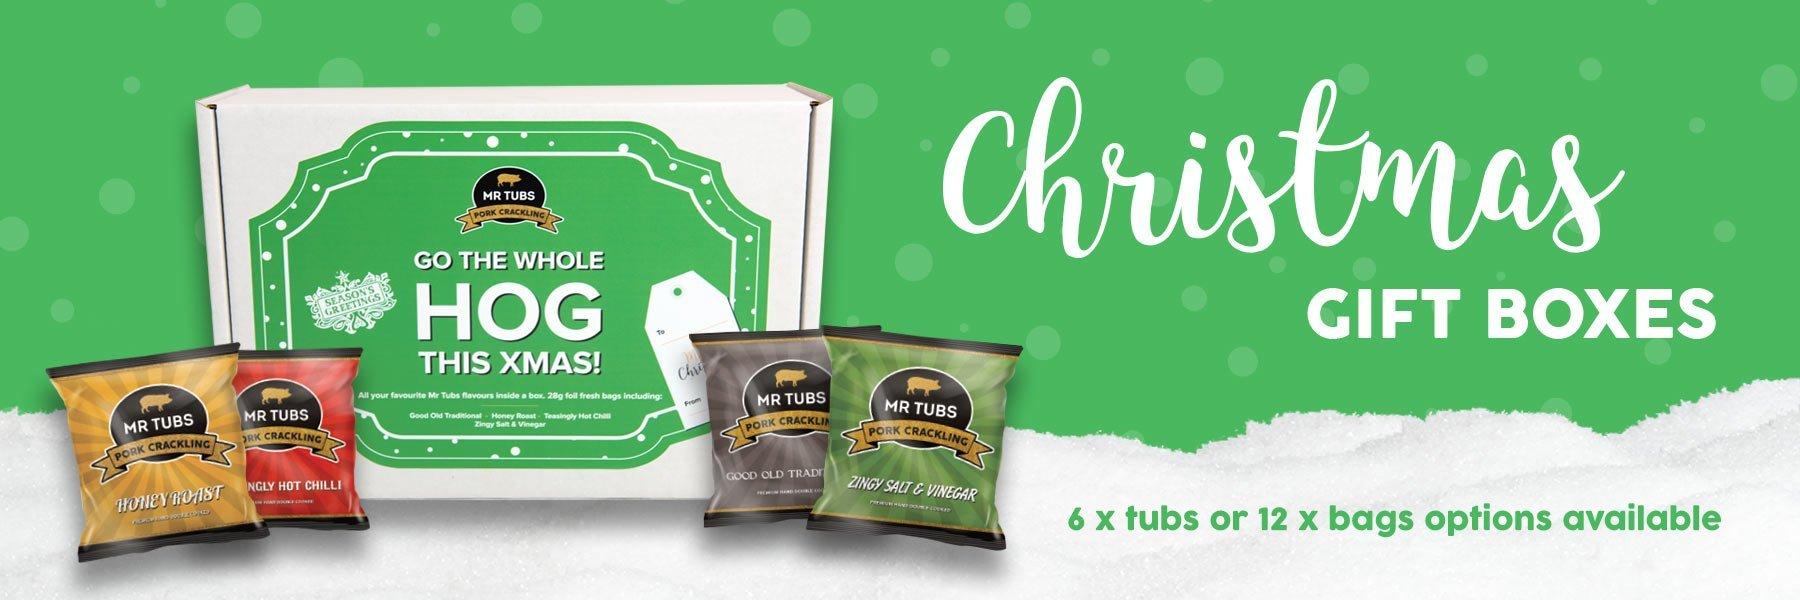 Mr-Tubs-Christmas-Gift-Boxes-all-bags1